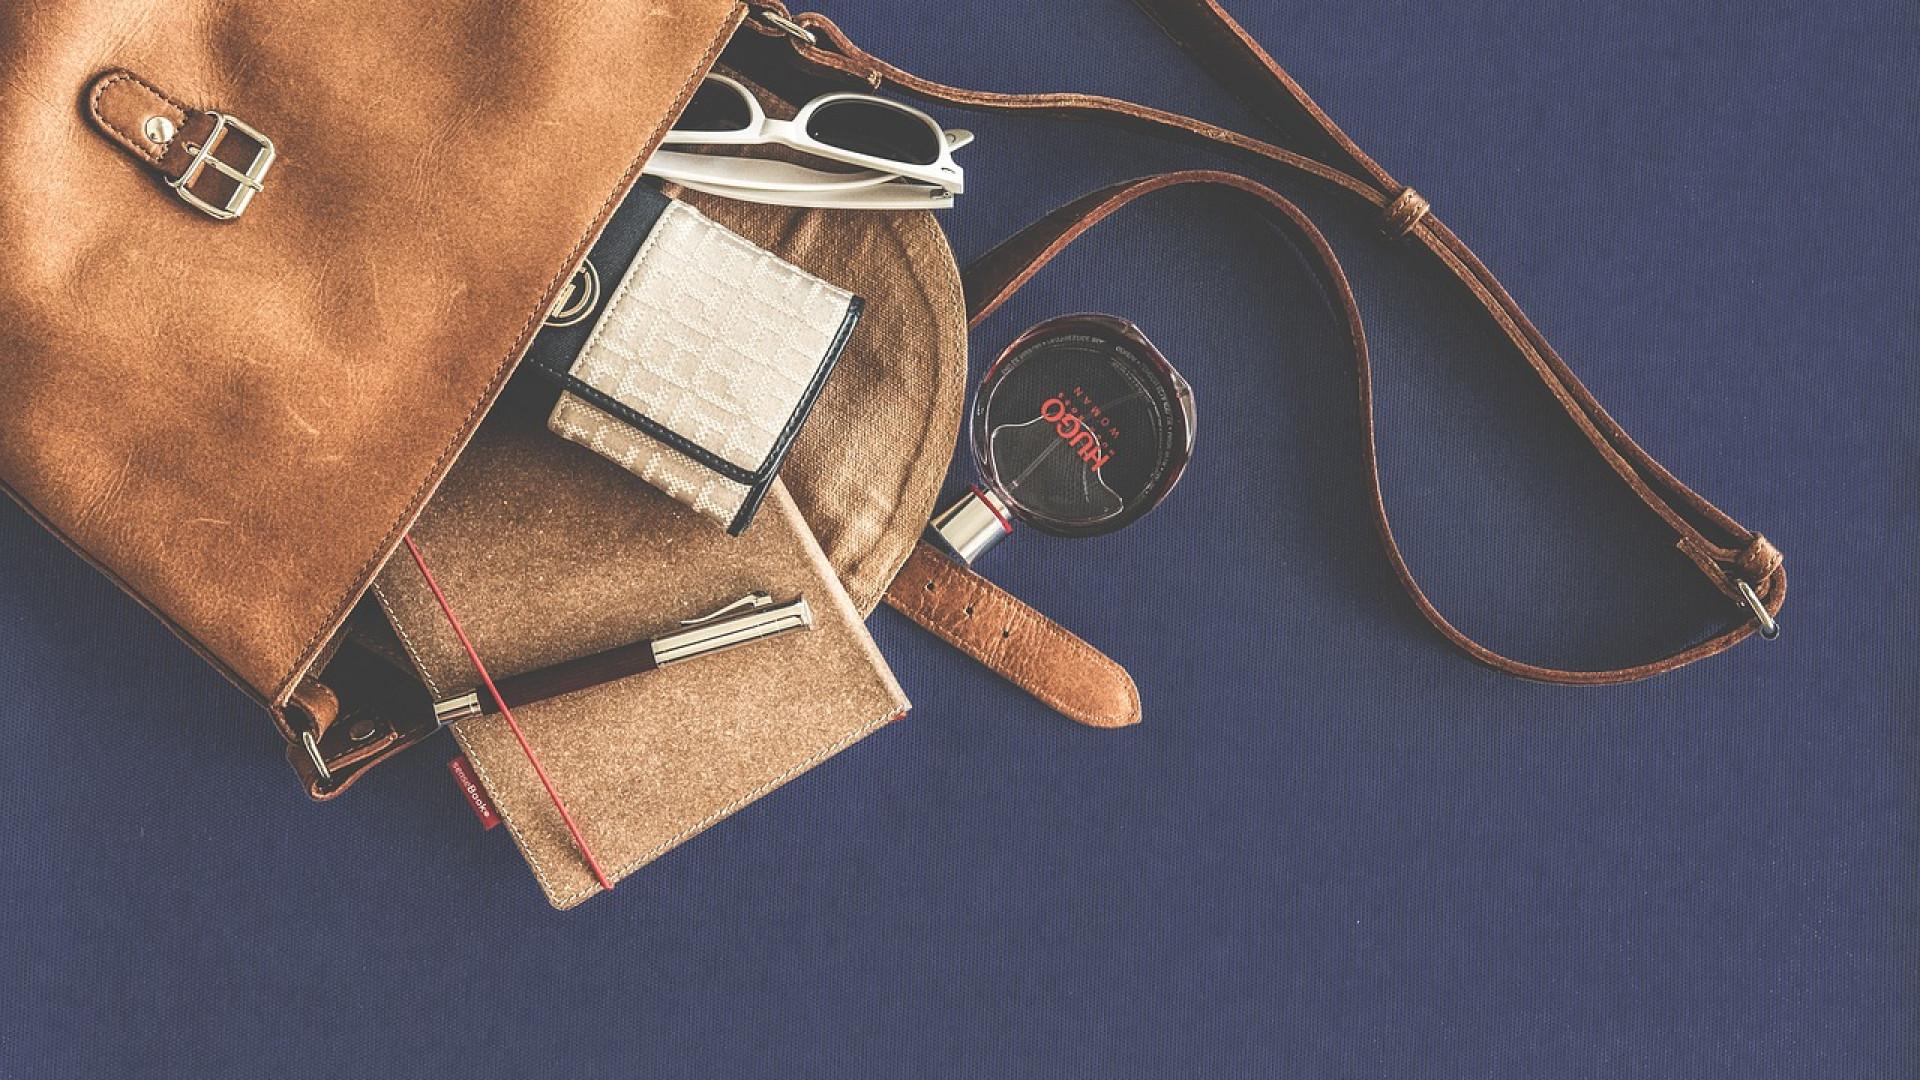 Choisir de la maroquinerie de luxe